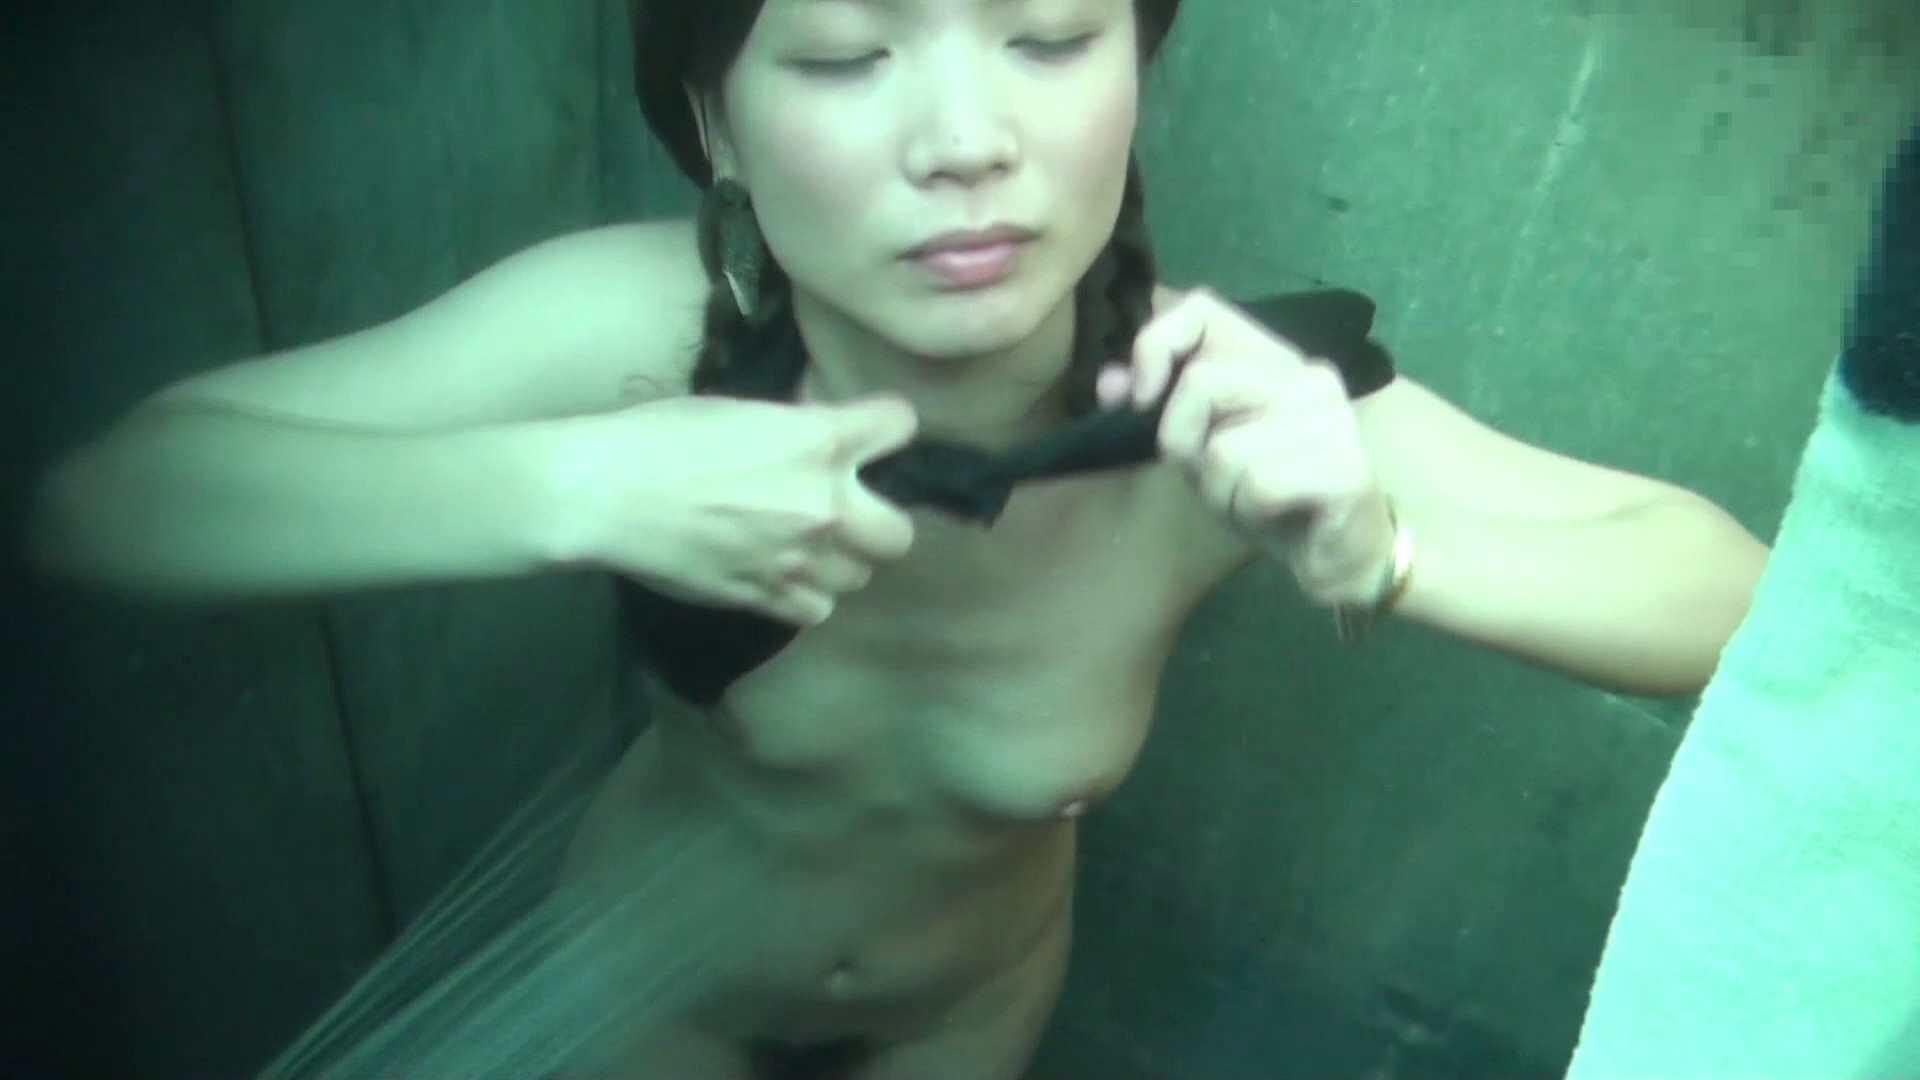 Vol.12 女性の性器には予想外の砂が混入しているようです。 シャワー中 | 高画質  96連発 30